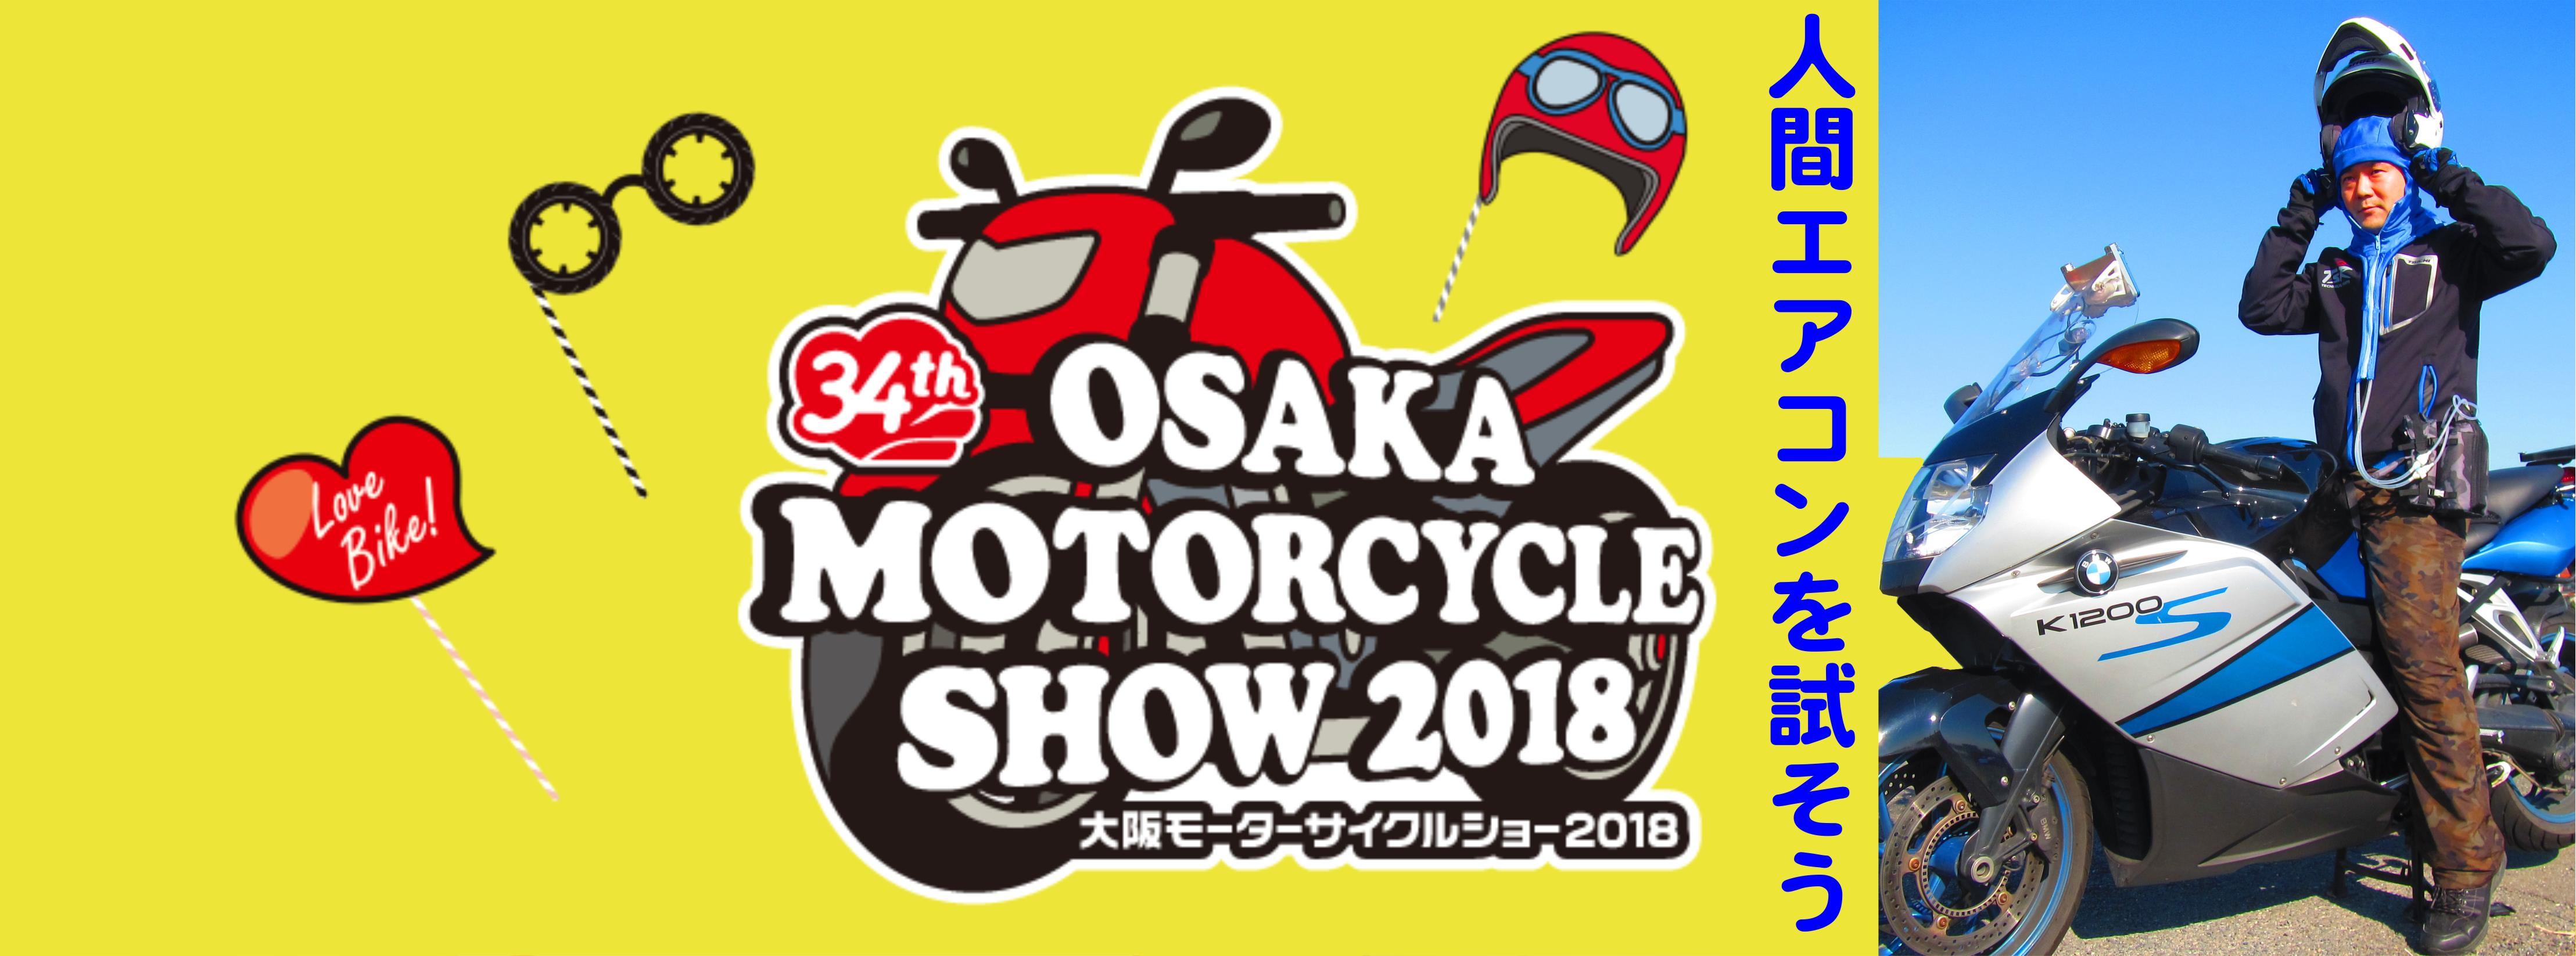 motorcycleshow2018